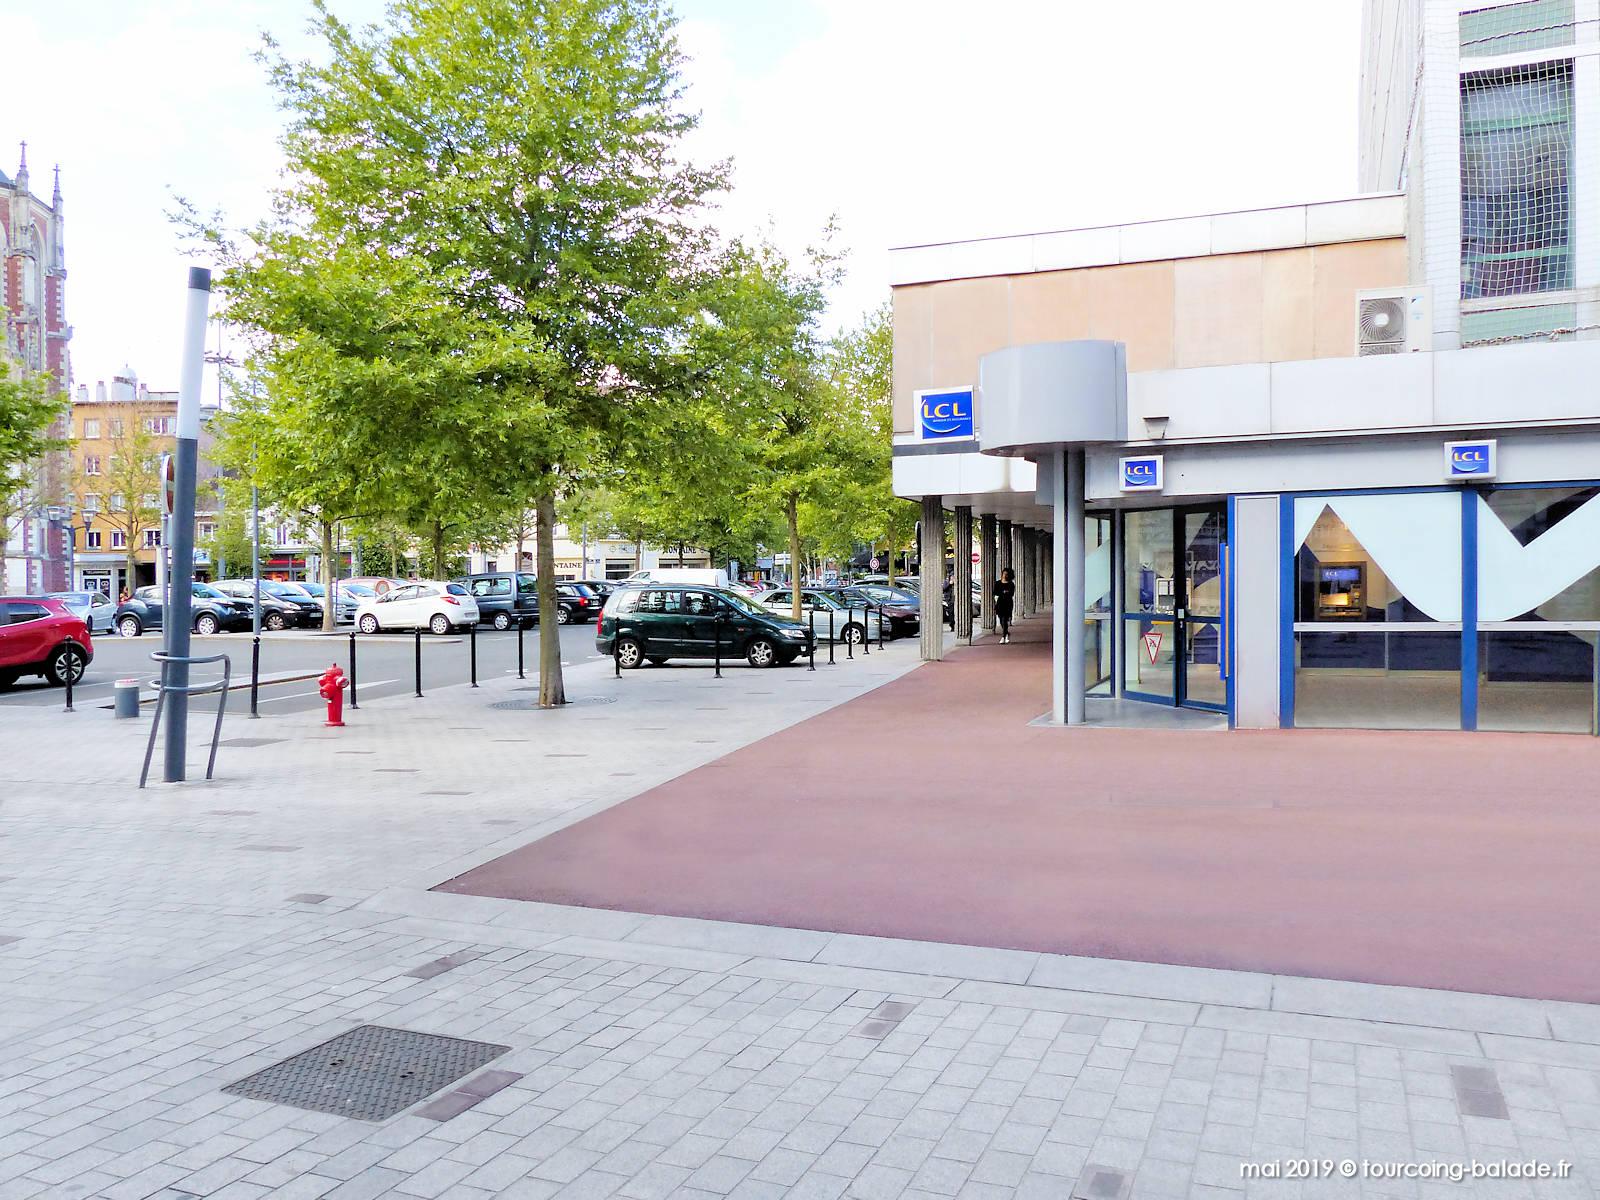 LCL Banque Assurance, Tourcoing